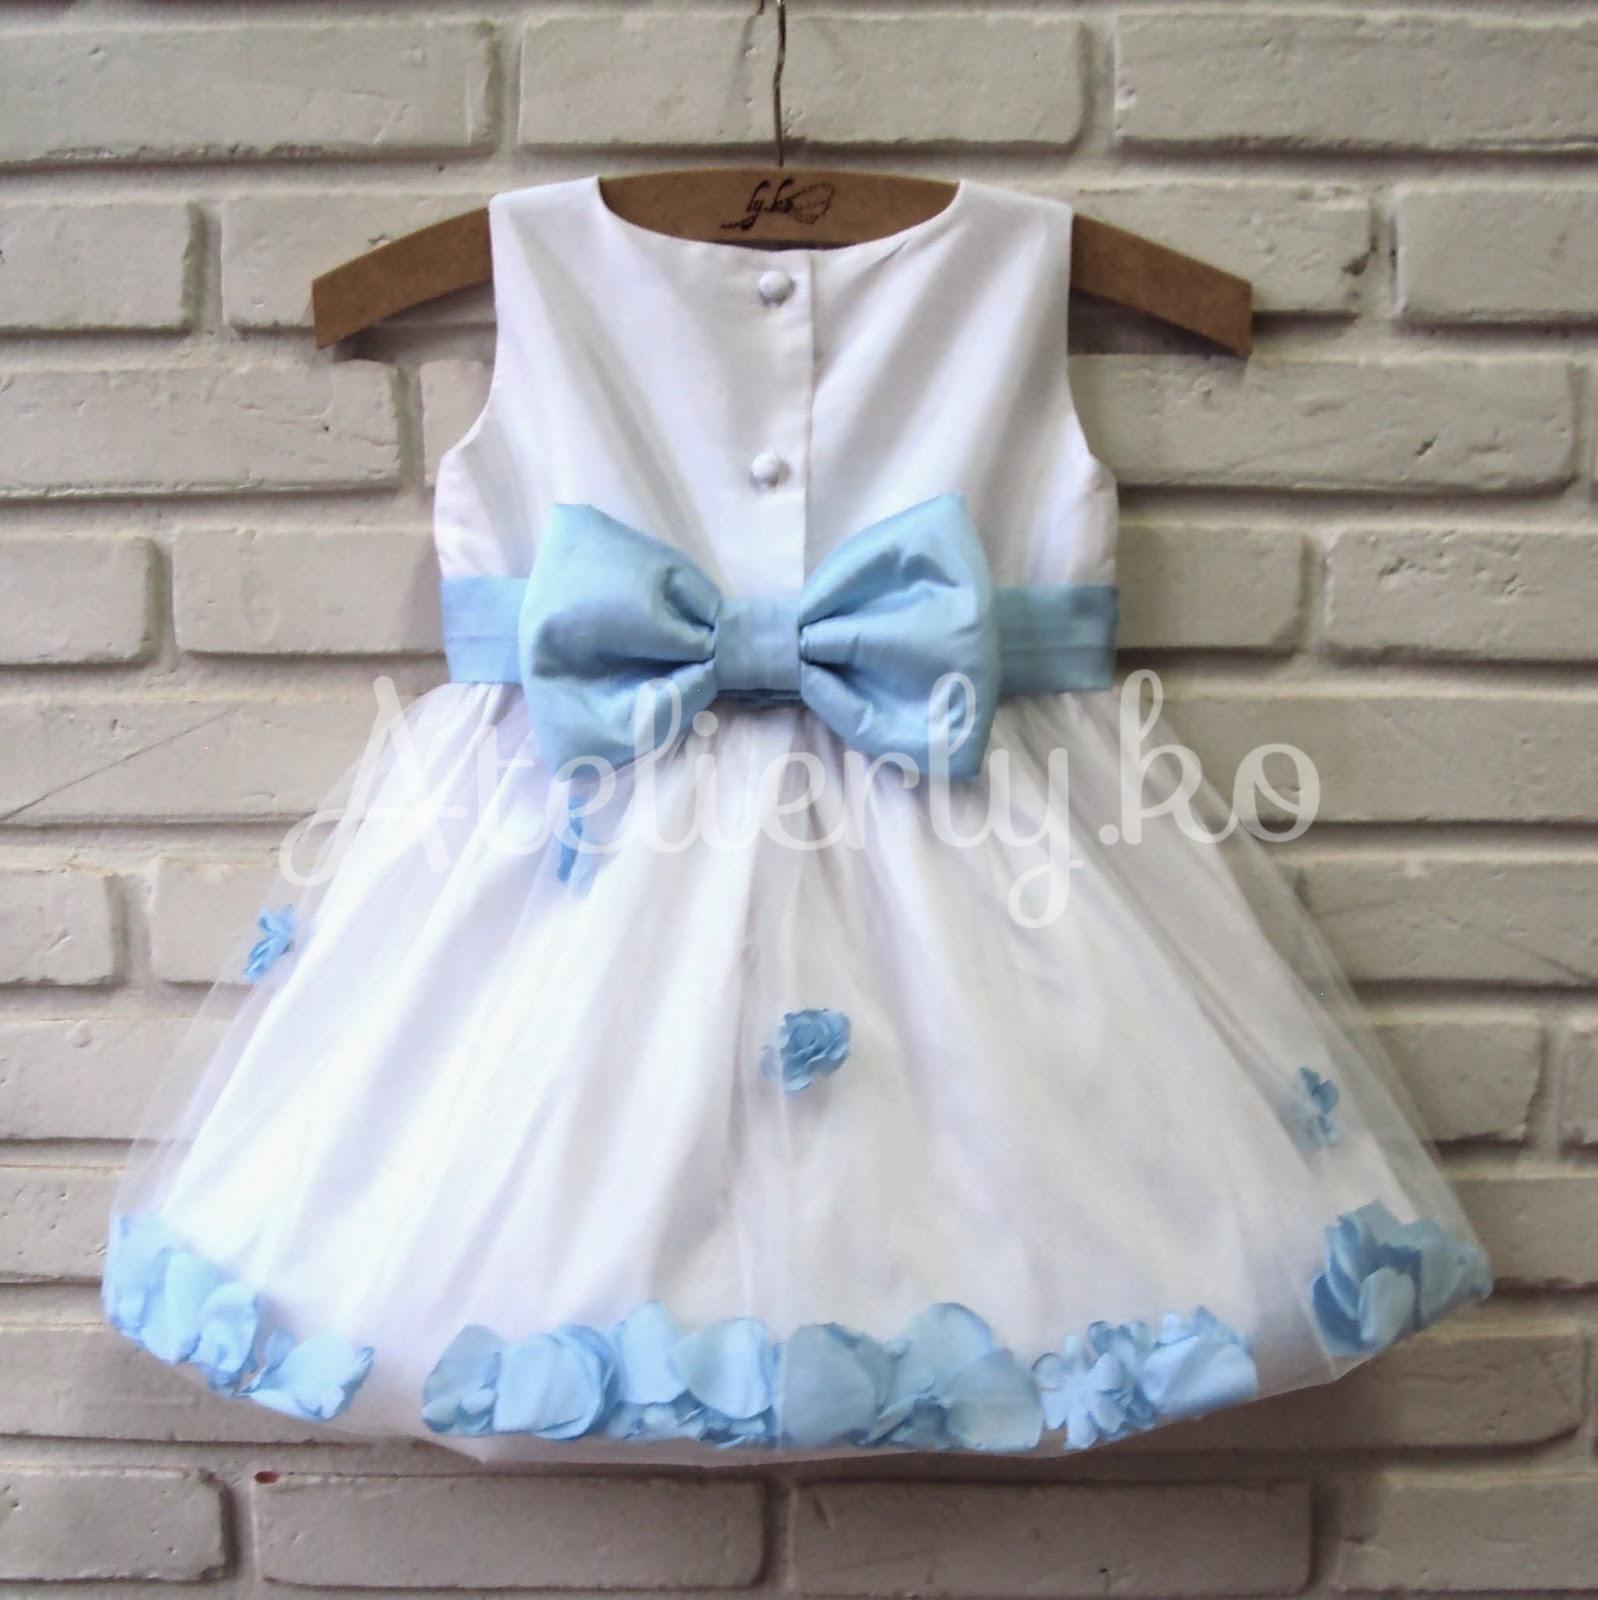 Atelier fez vestido de 1 ano da alice for Jardineira bebe 1 ano